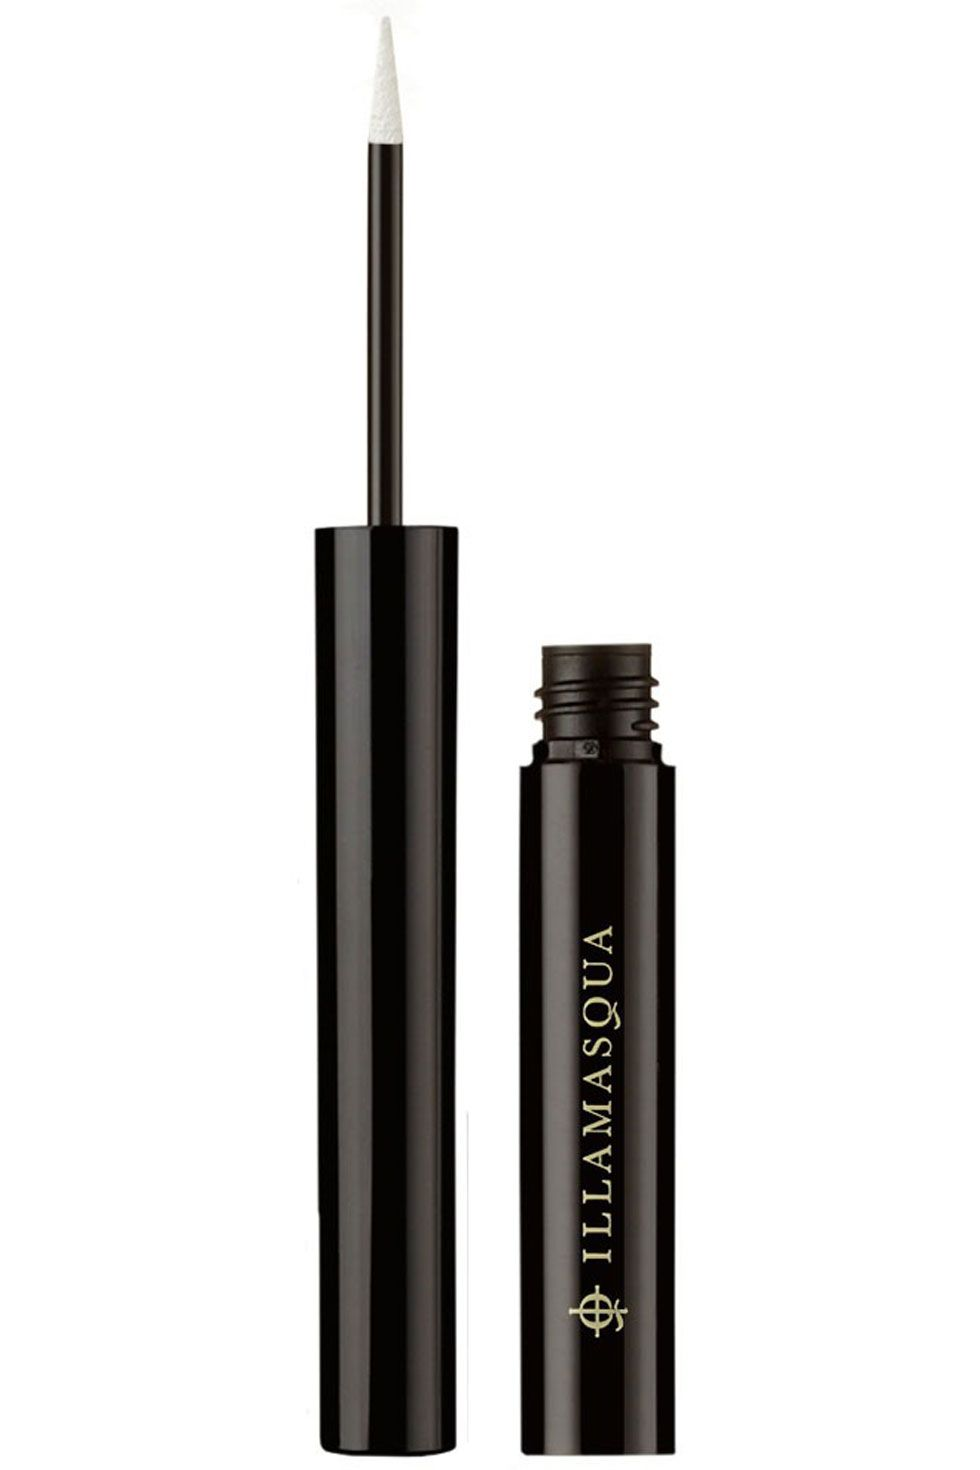 "Illamasqua Precision Ink in Scribe Pure White, $28; <a target=""_blank"" href=""http://www.illamasqua.com/shop/eyes/eye-liners/scribe-precision-ink/"">illamasqua.com</a>"